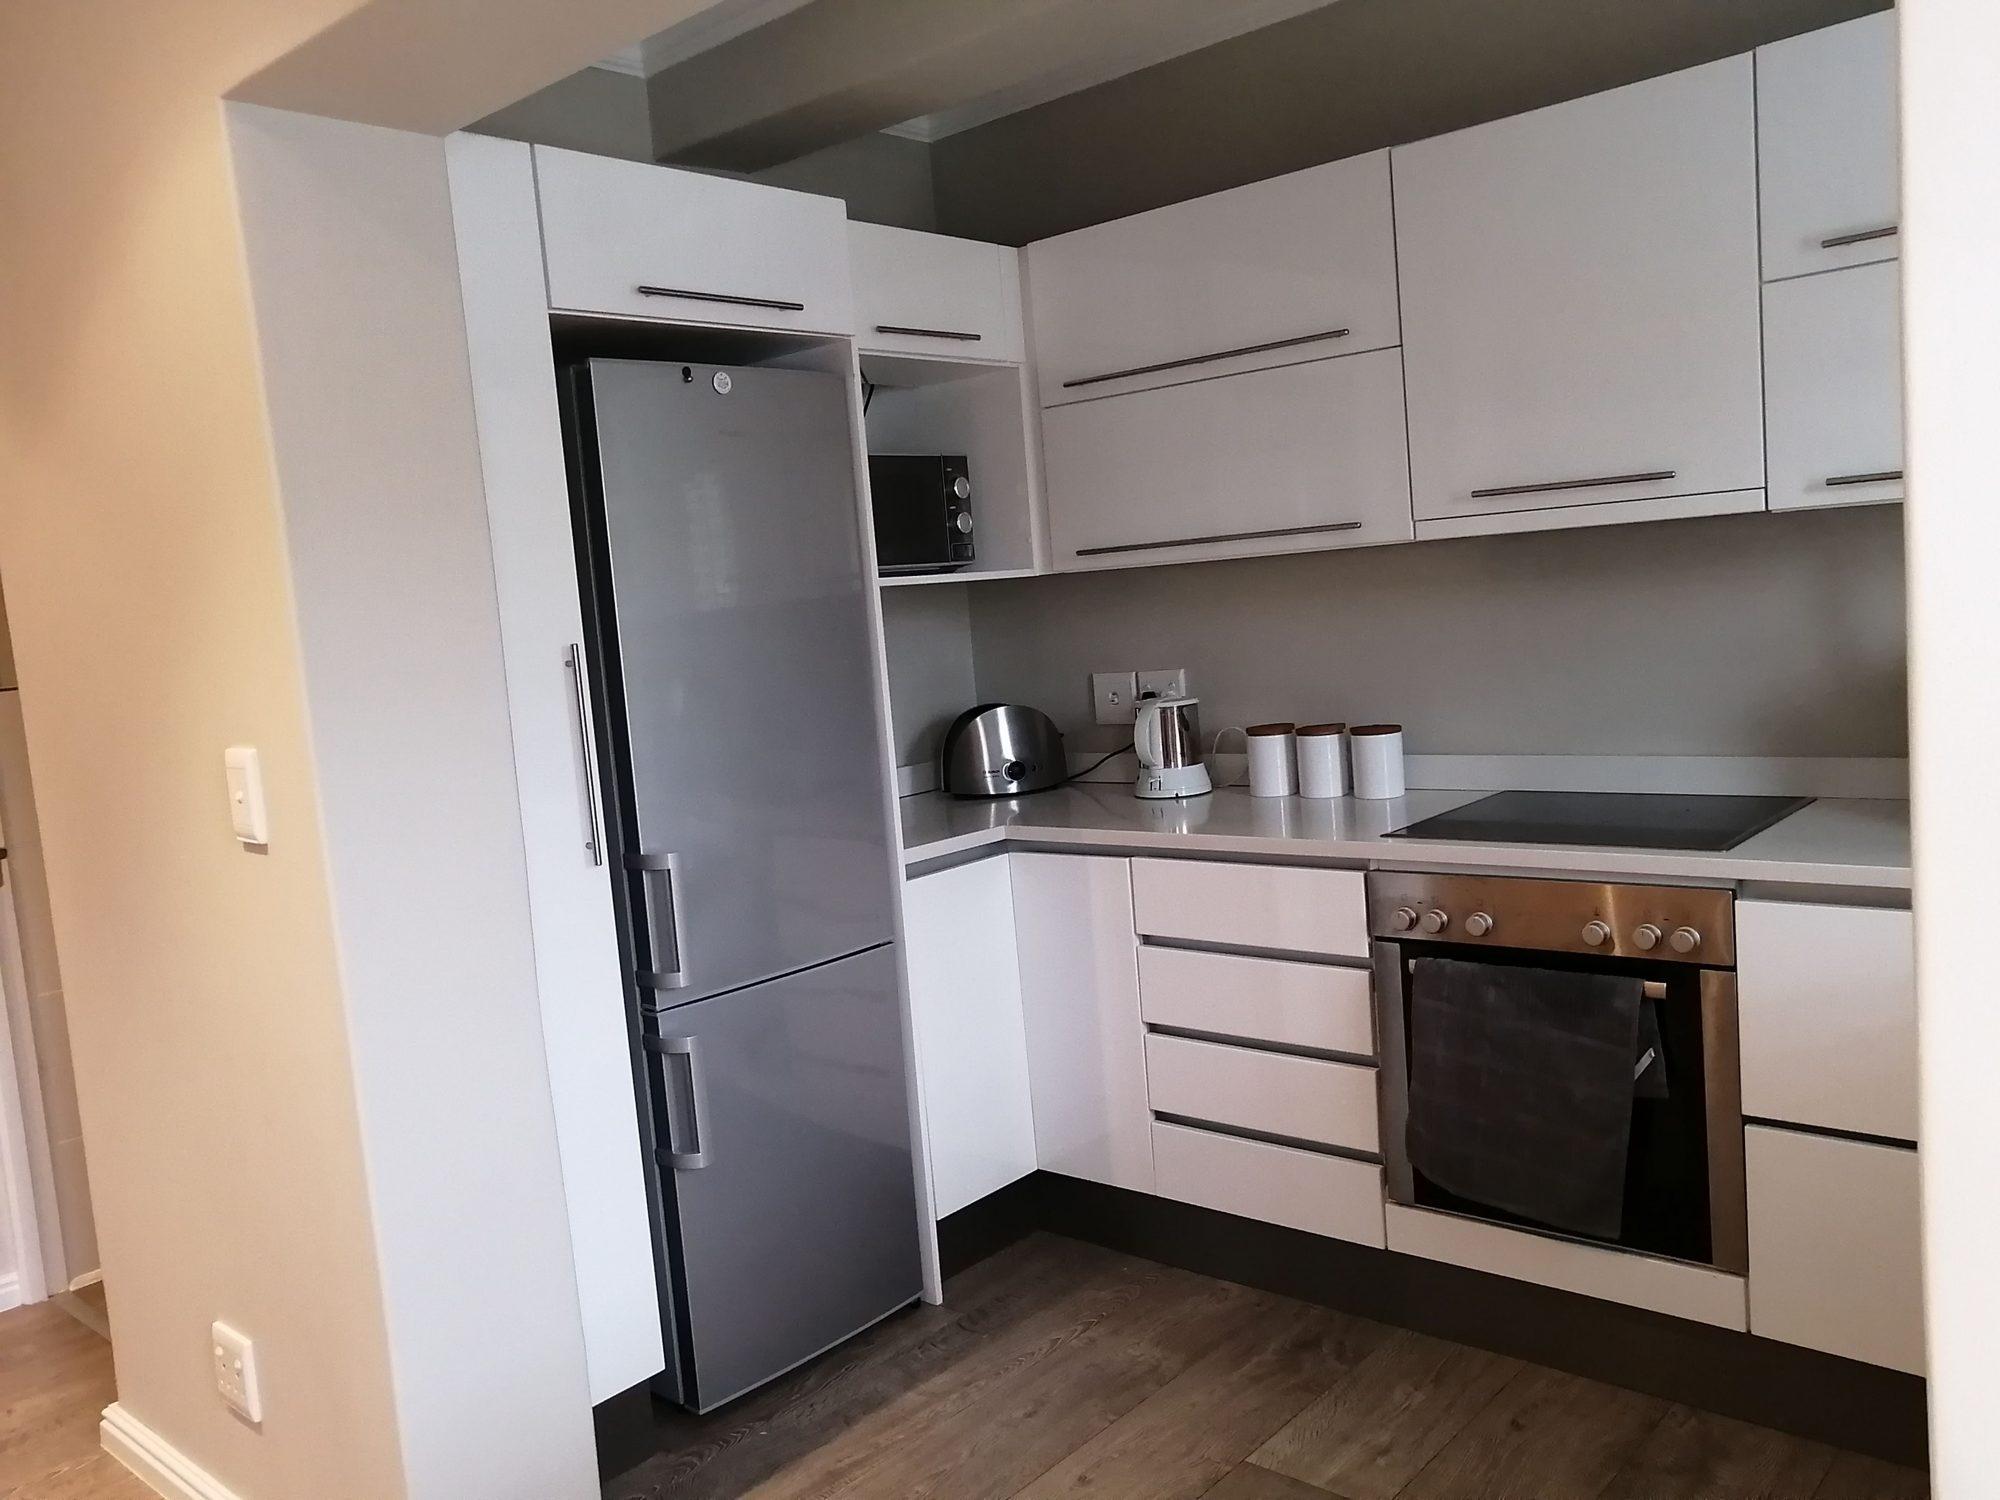 9 on Camp Apartments – Oranjezicht - Cape Town (6)